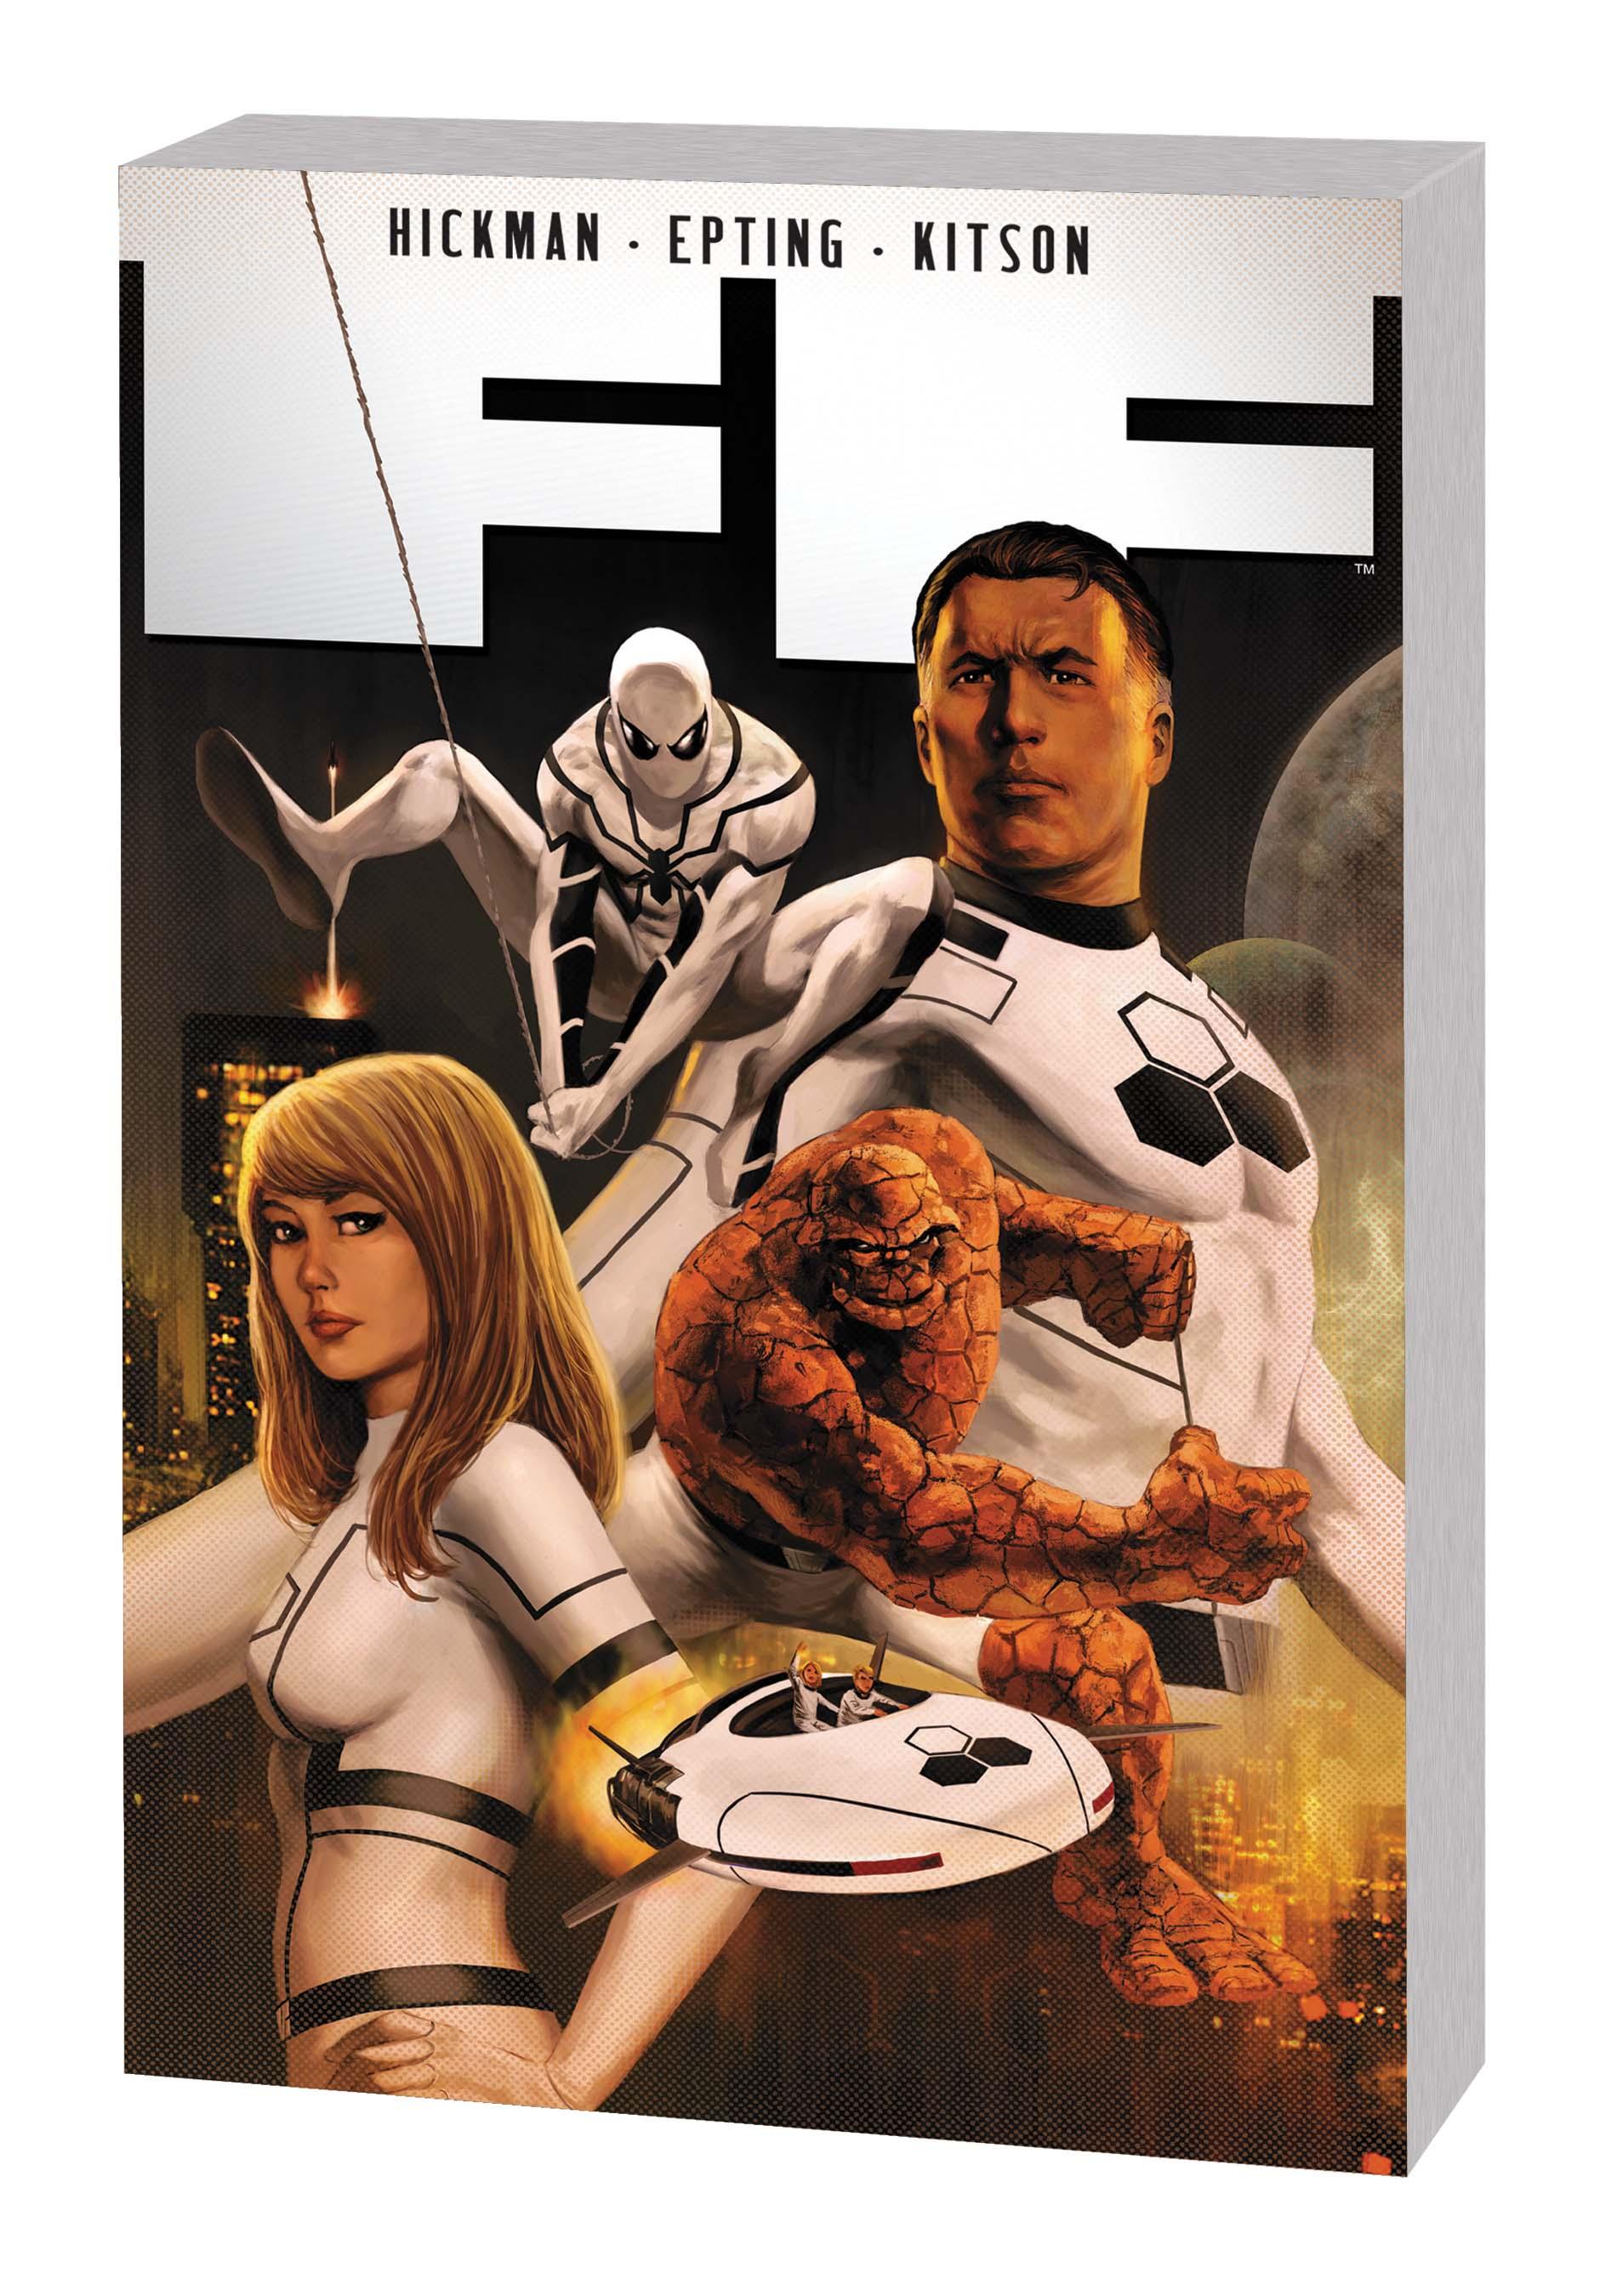 FF BY JONATHAN HICKMAN VOL. 1 TPB (Trade Paperback)